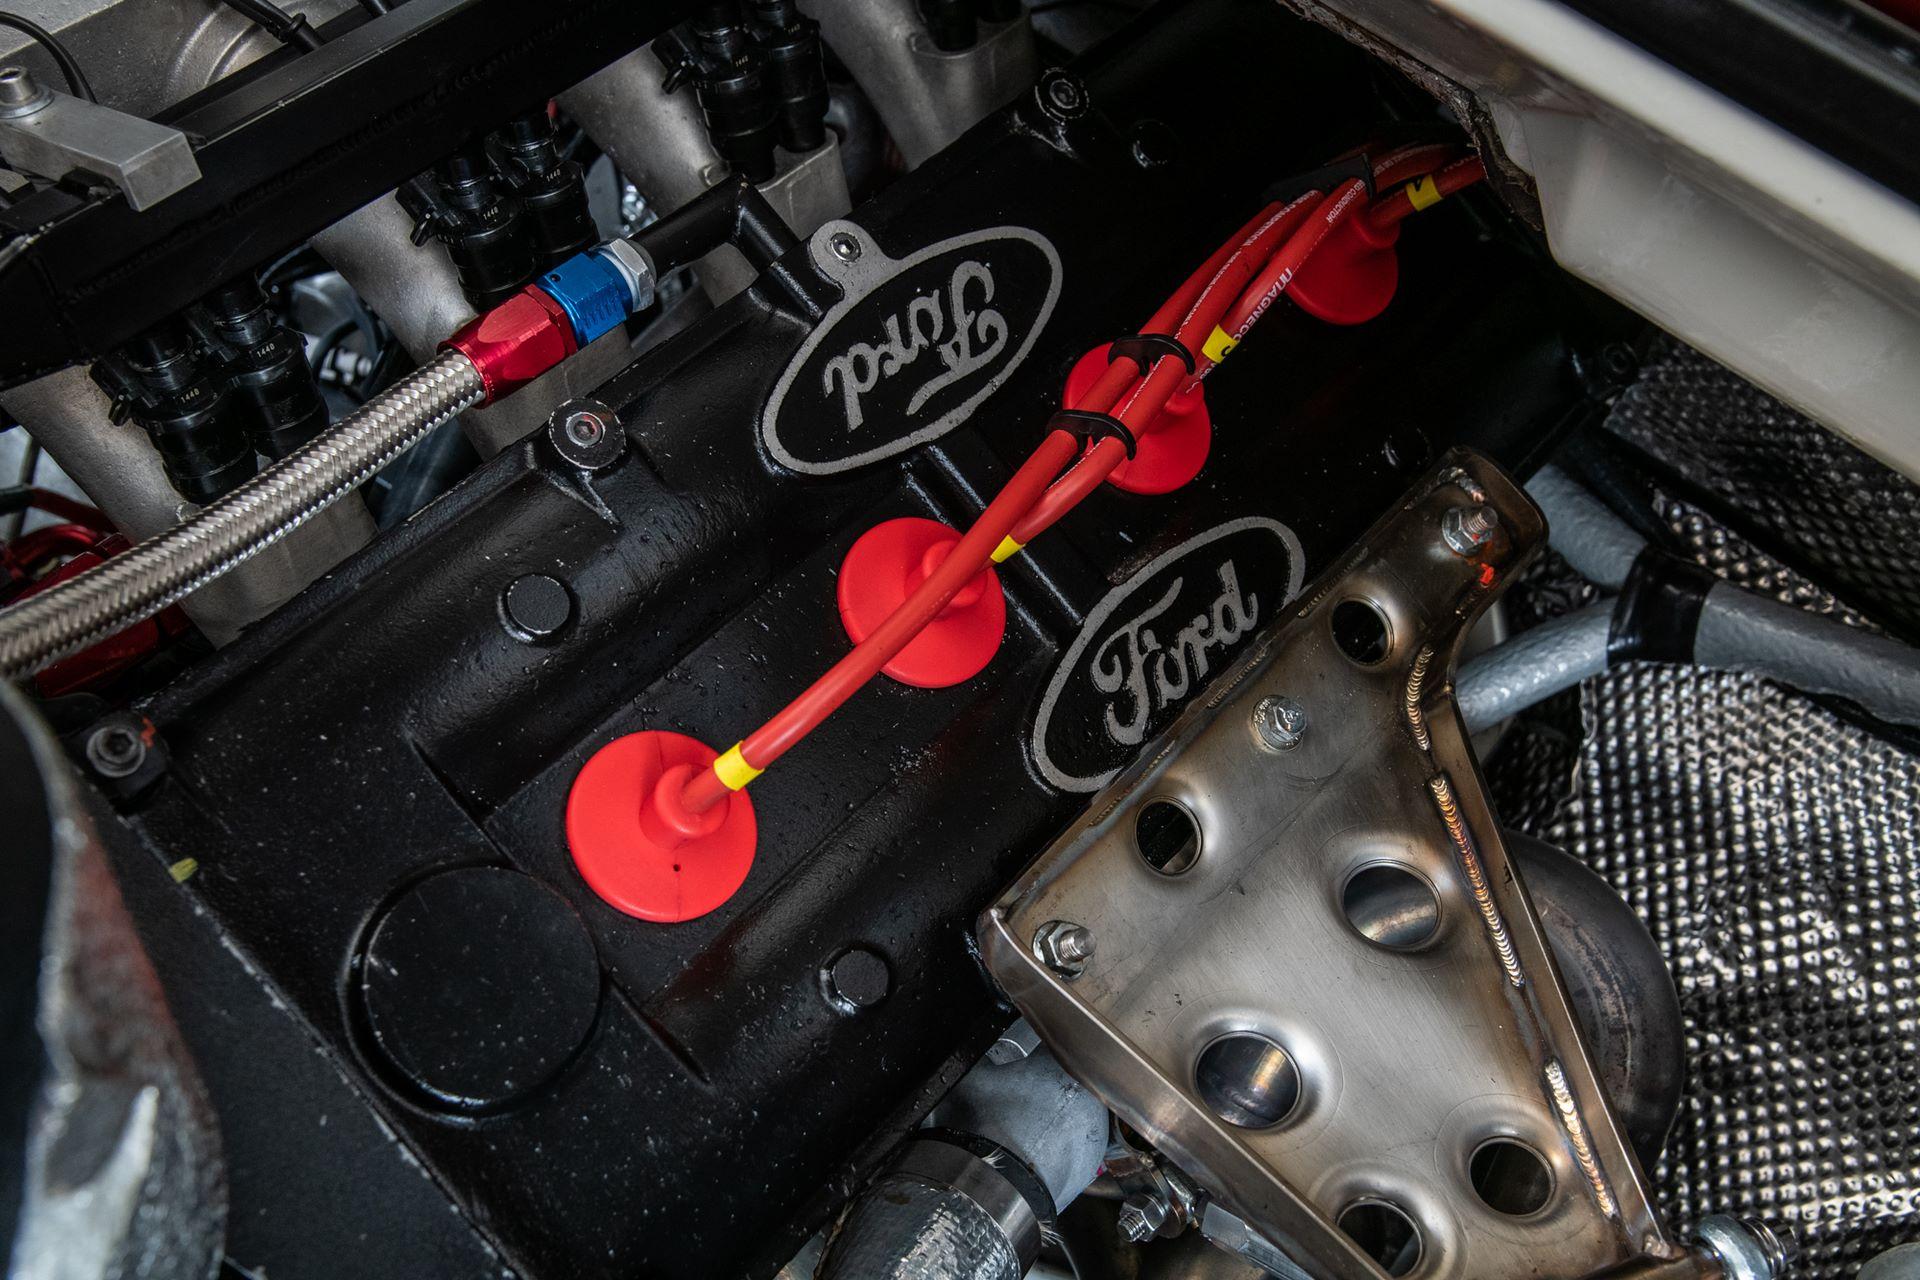 Ford-RS200-Evolution-Evo-for-sale-45